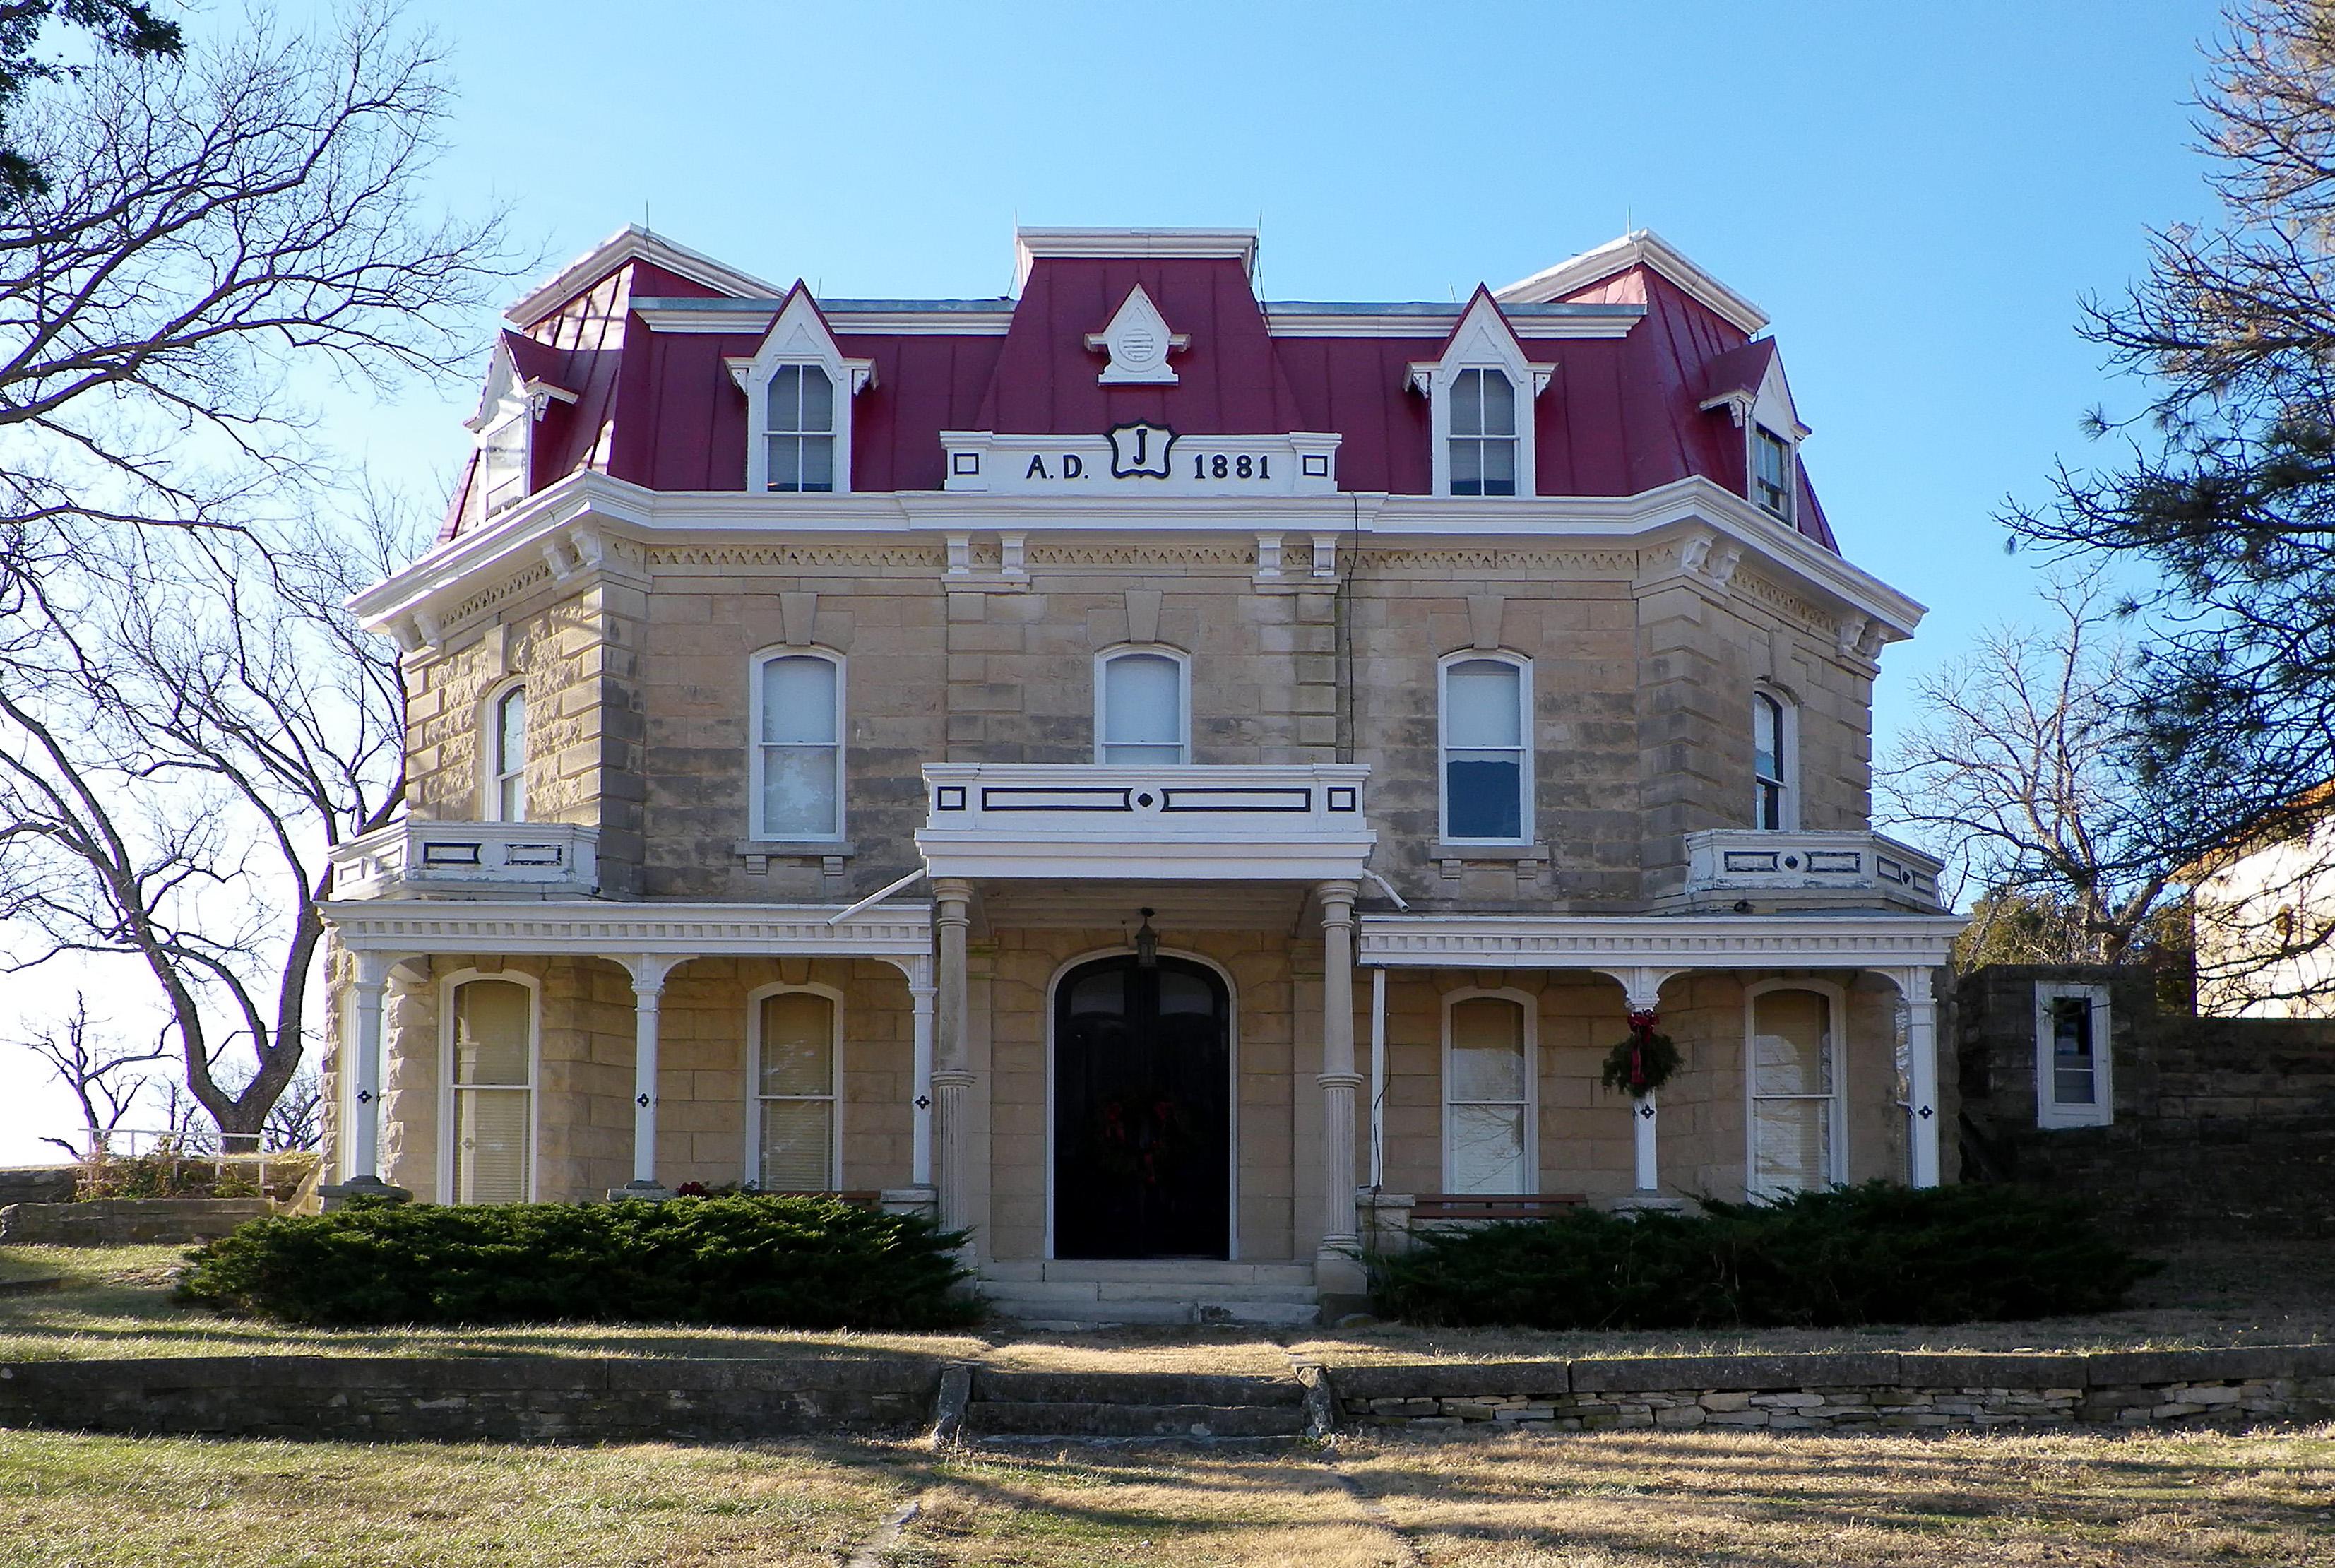 File:Z-bar-ranch-house.JPG - Wikimedia Commons